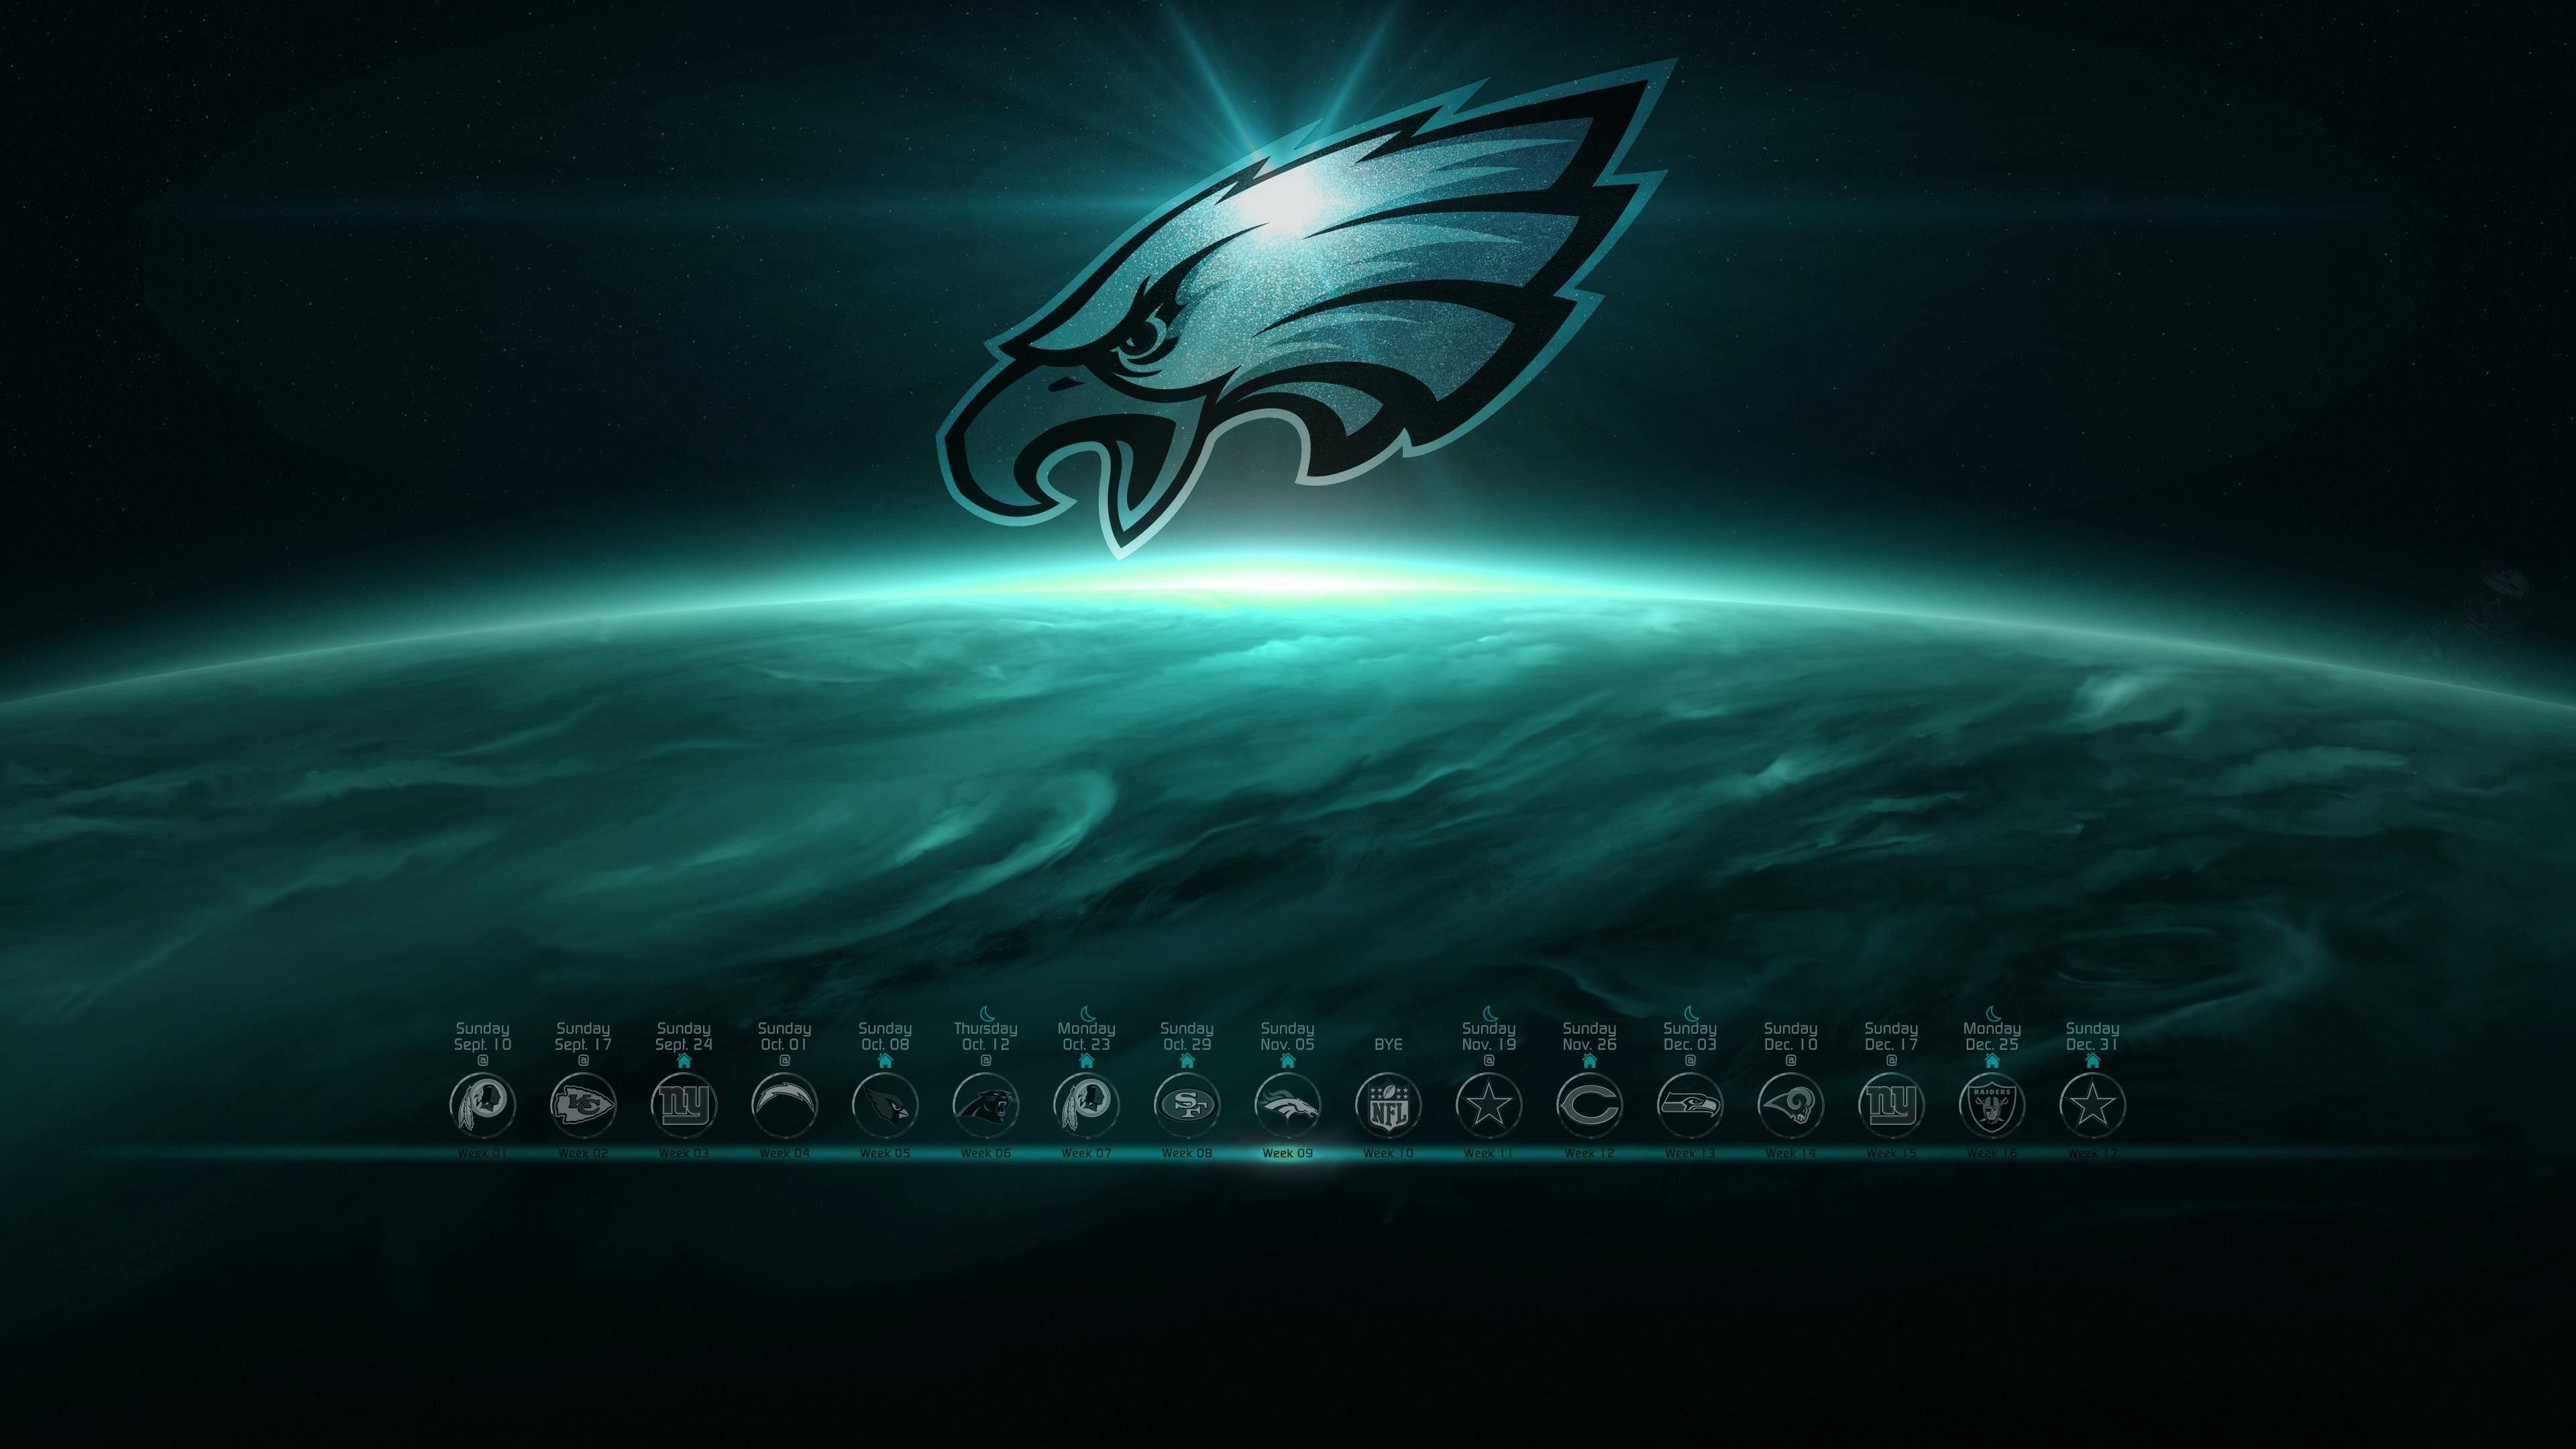 3840x2160 3840x2160 Philadelphia Eagles Wallpaper 2017 With